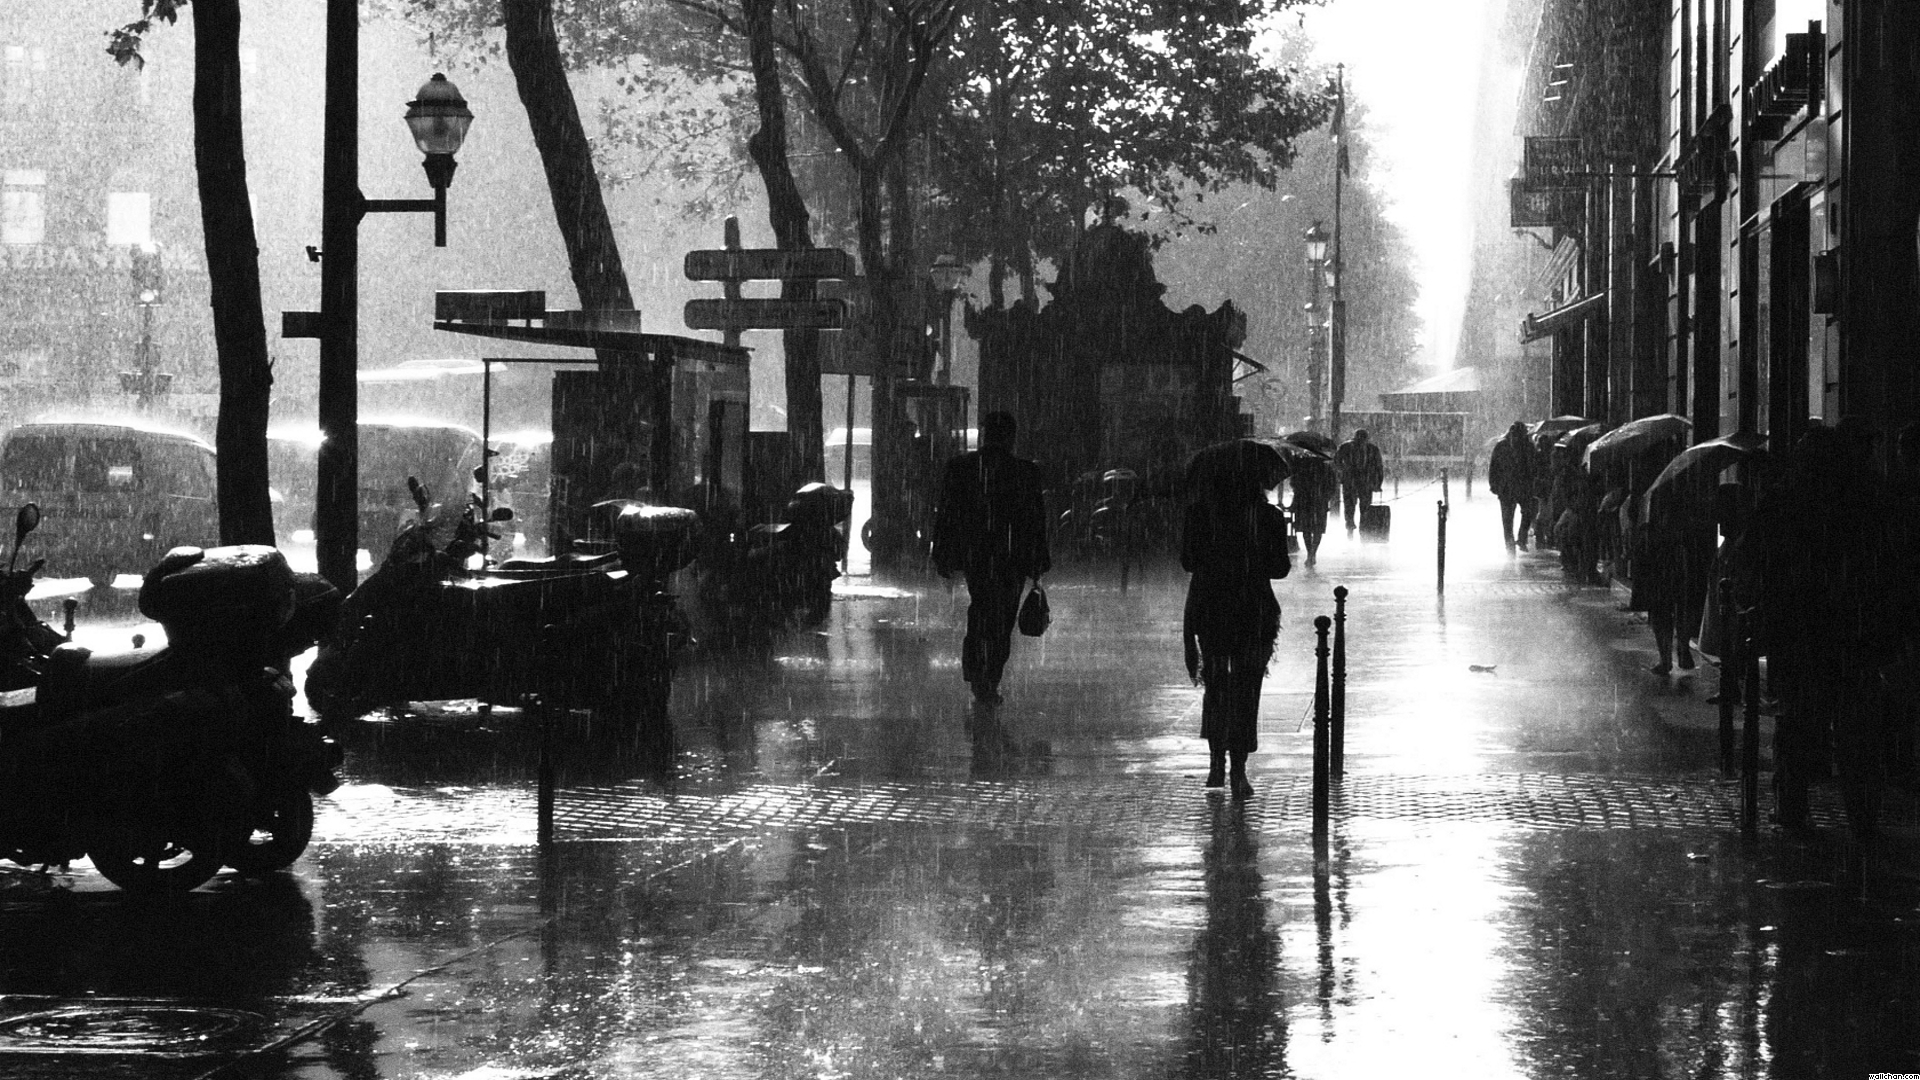 paris france storm rain wet water monochrome black white cities sidewalk people urban buildings. Black Bedroom Furniture Sets. Home Design Ideas